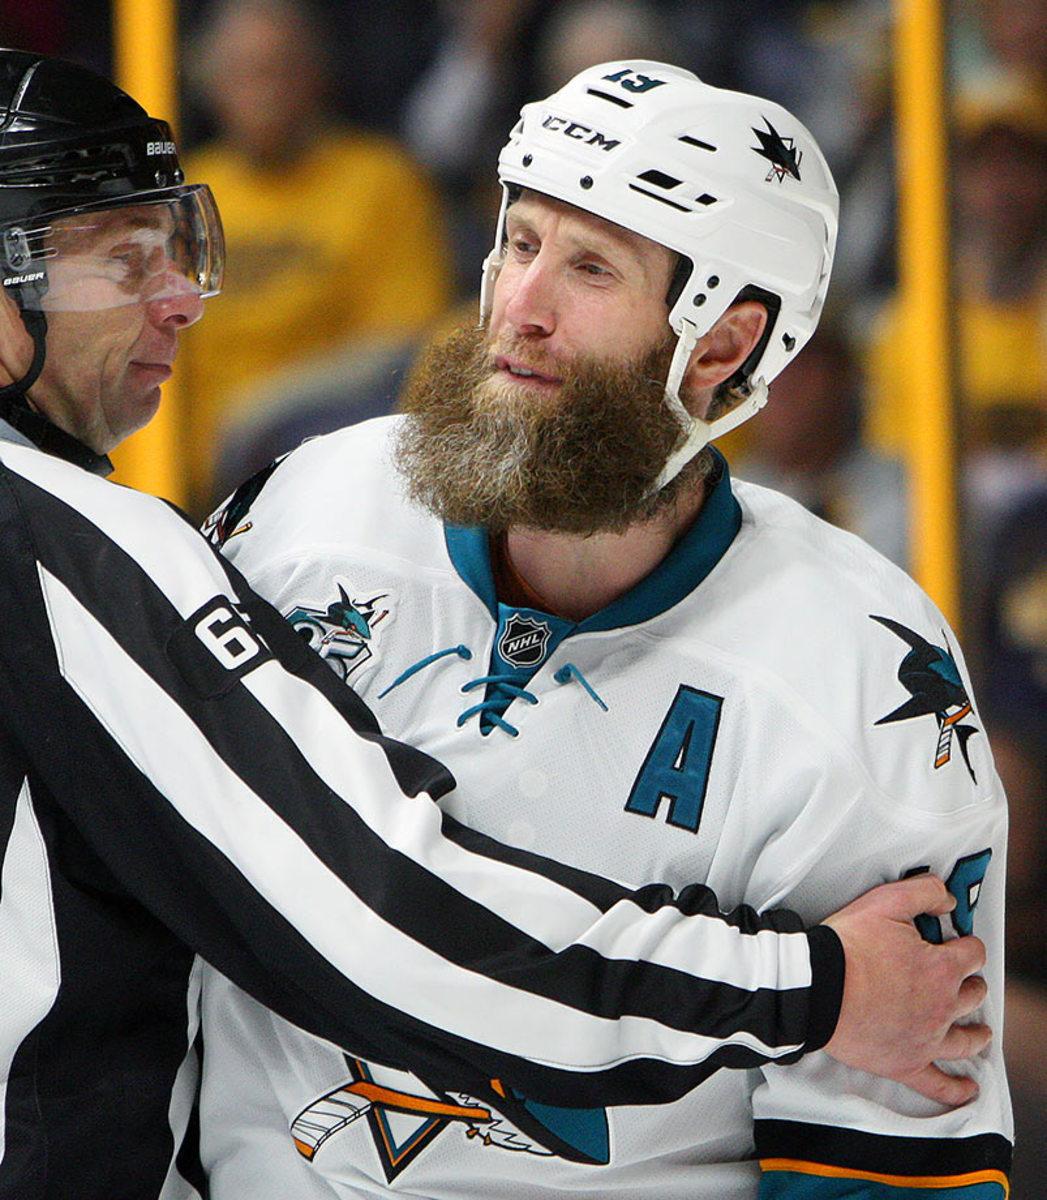 2016-Joe-Thornton-playoff-beard.jpg